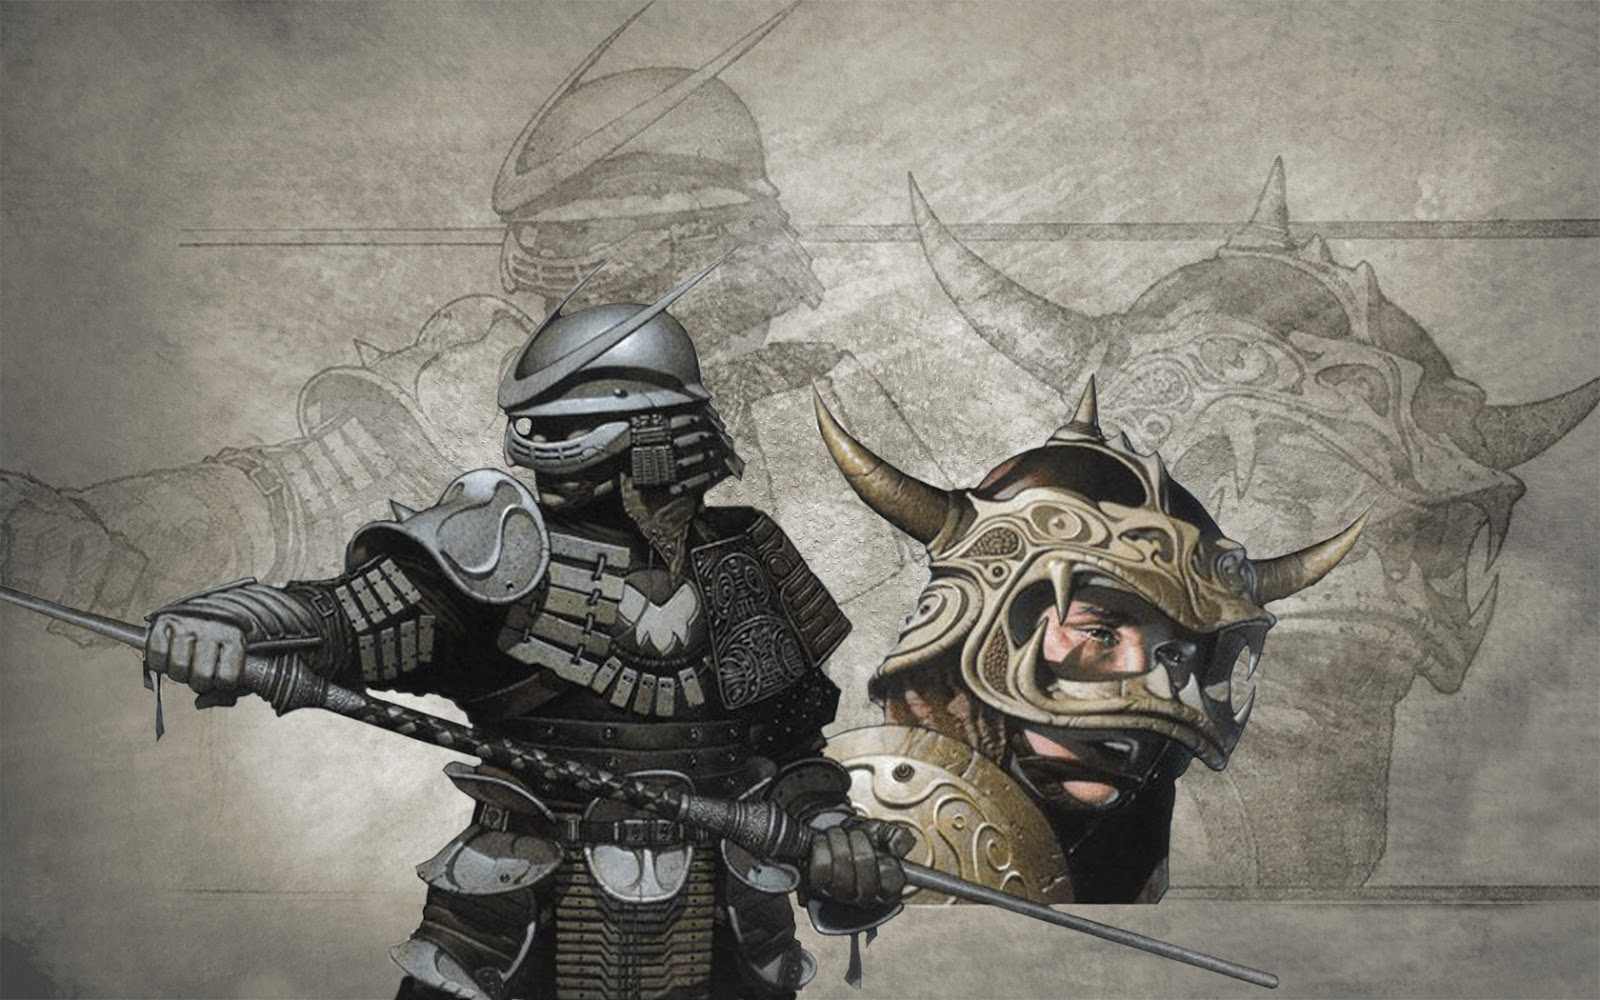 Free Download Japanese Samurai Wallpaper 1600x1000 For